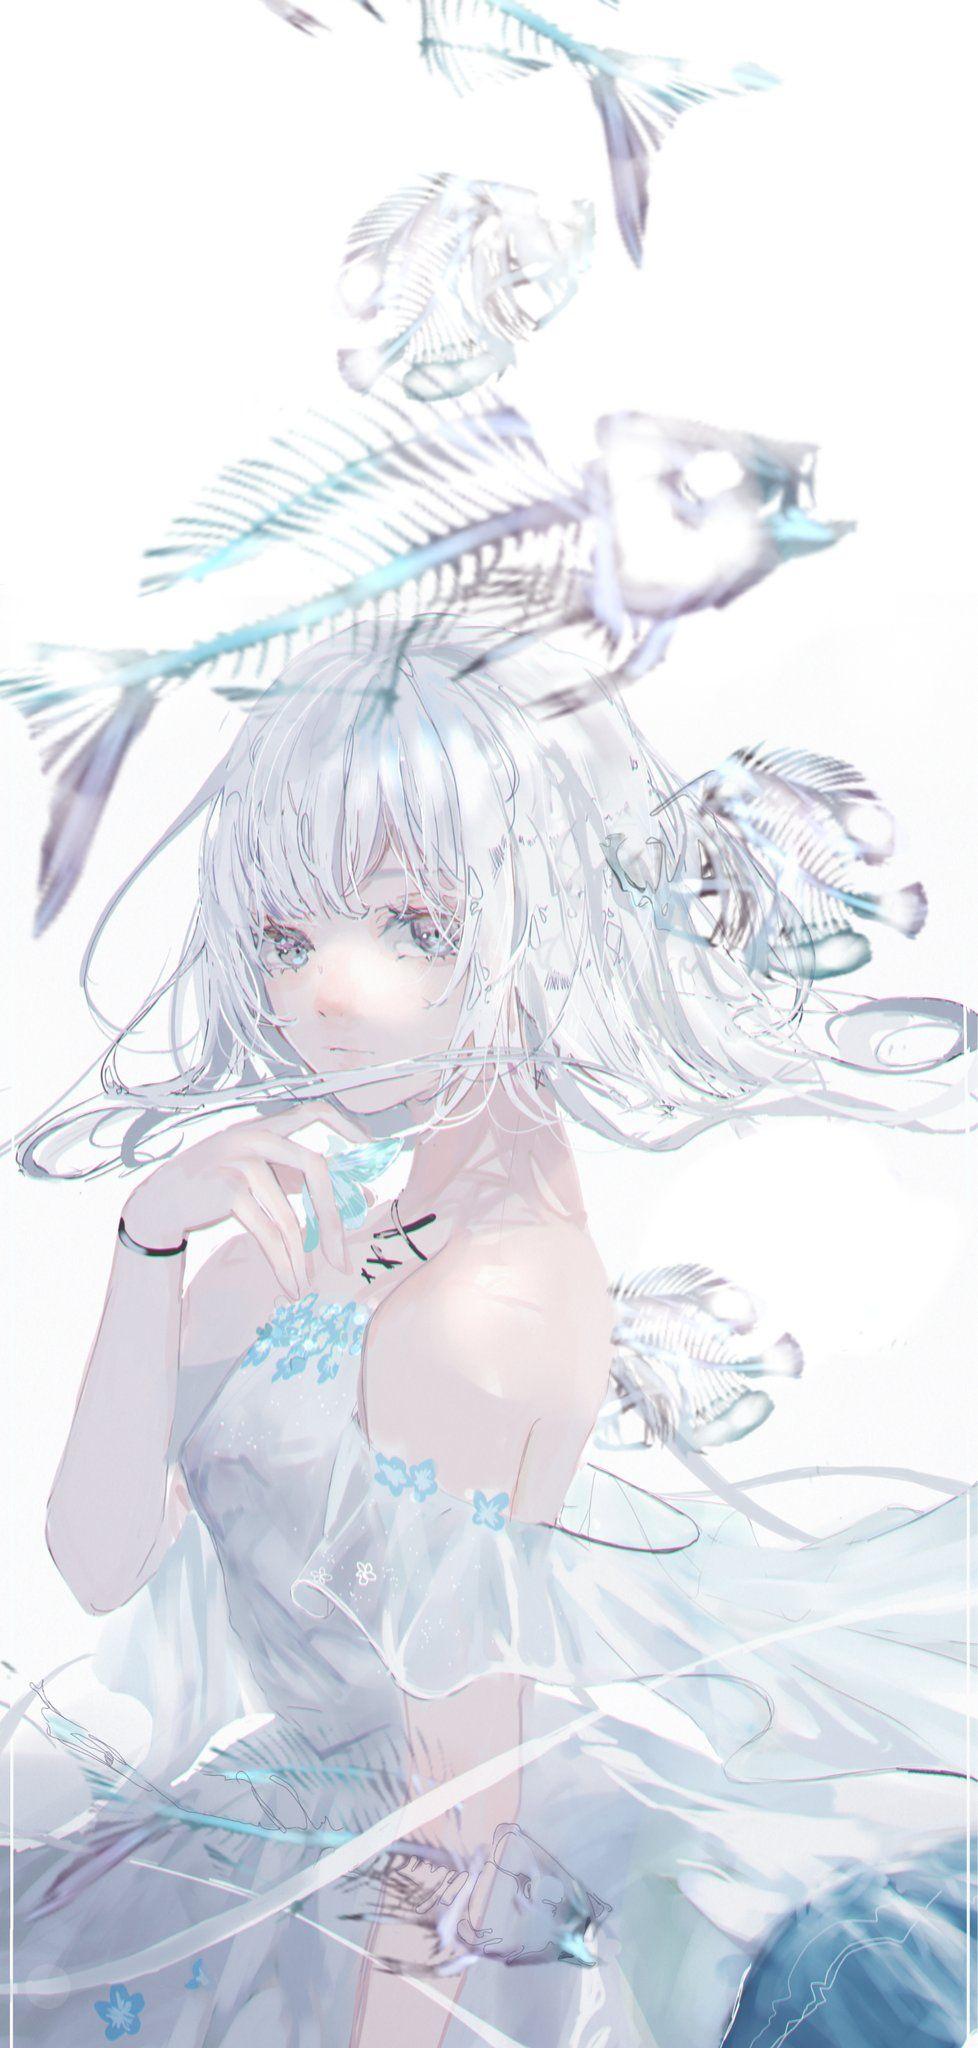 Photo of 水 縹 *° on Twitter